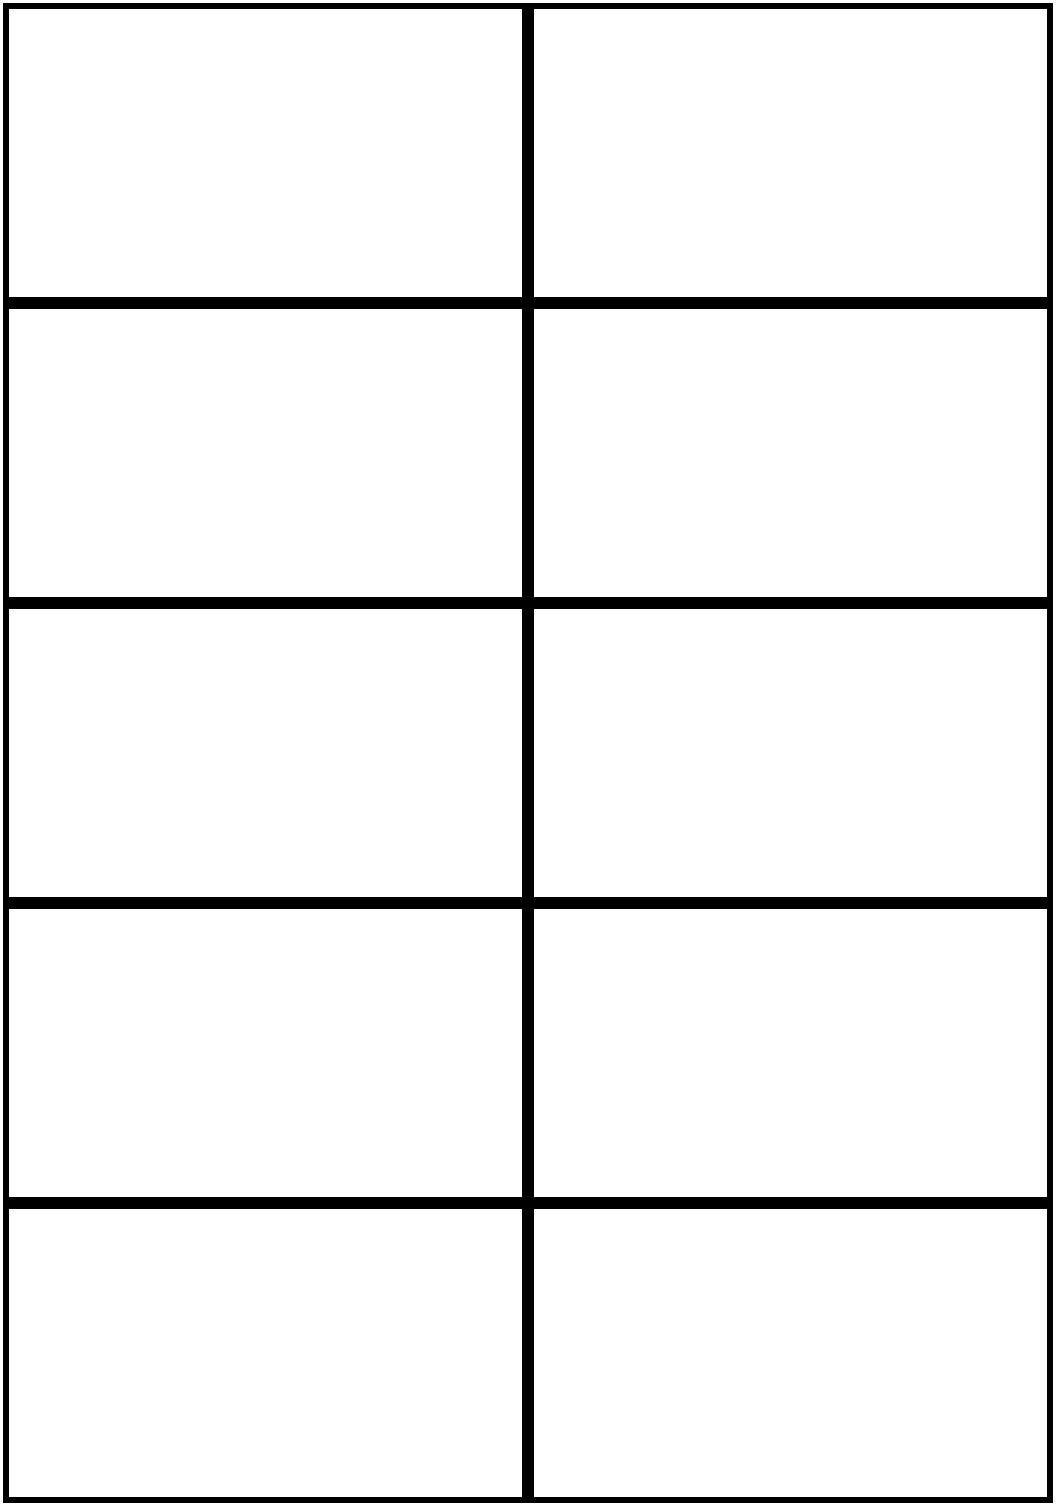 Image Result For Flashcards Template Word | Worksheets | Free - Free Printable Flash Card Maker Online